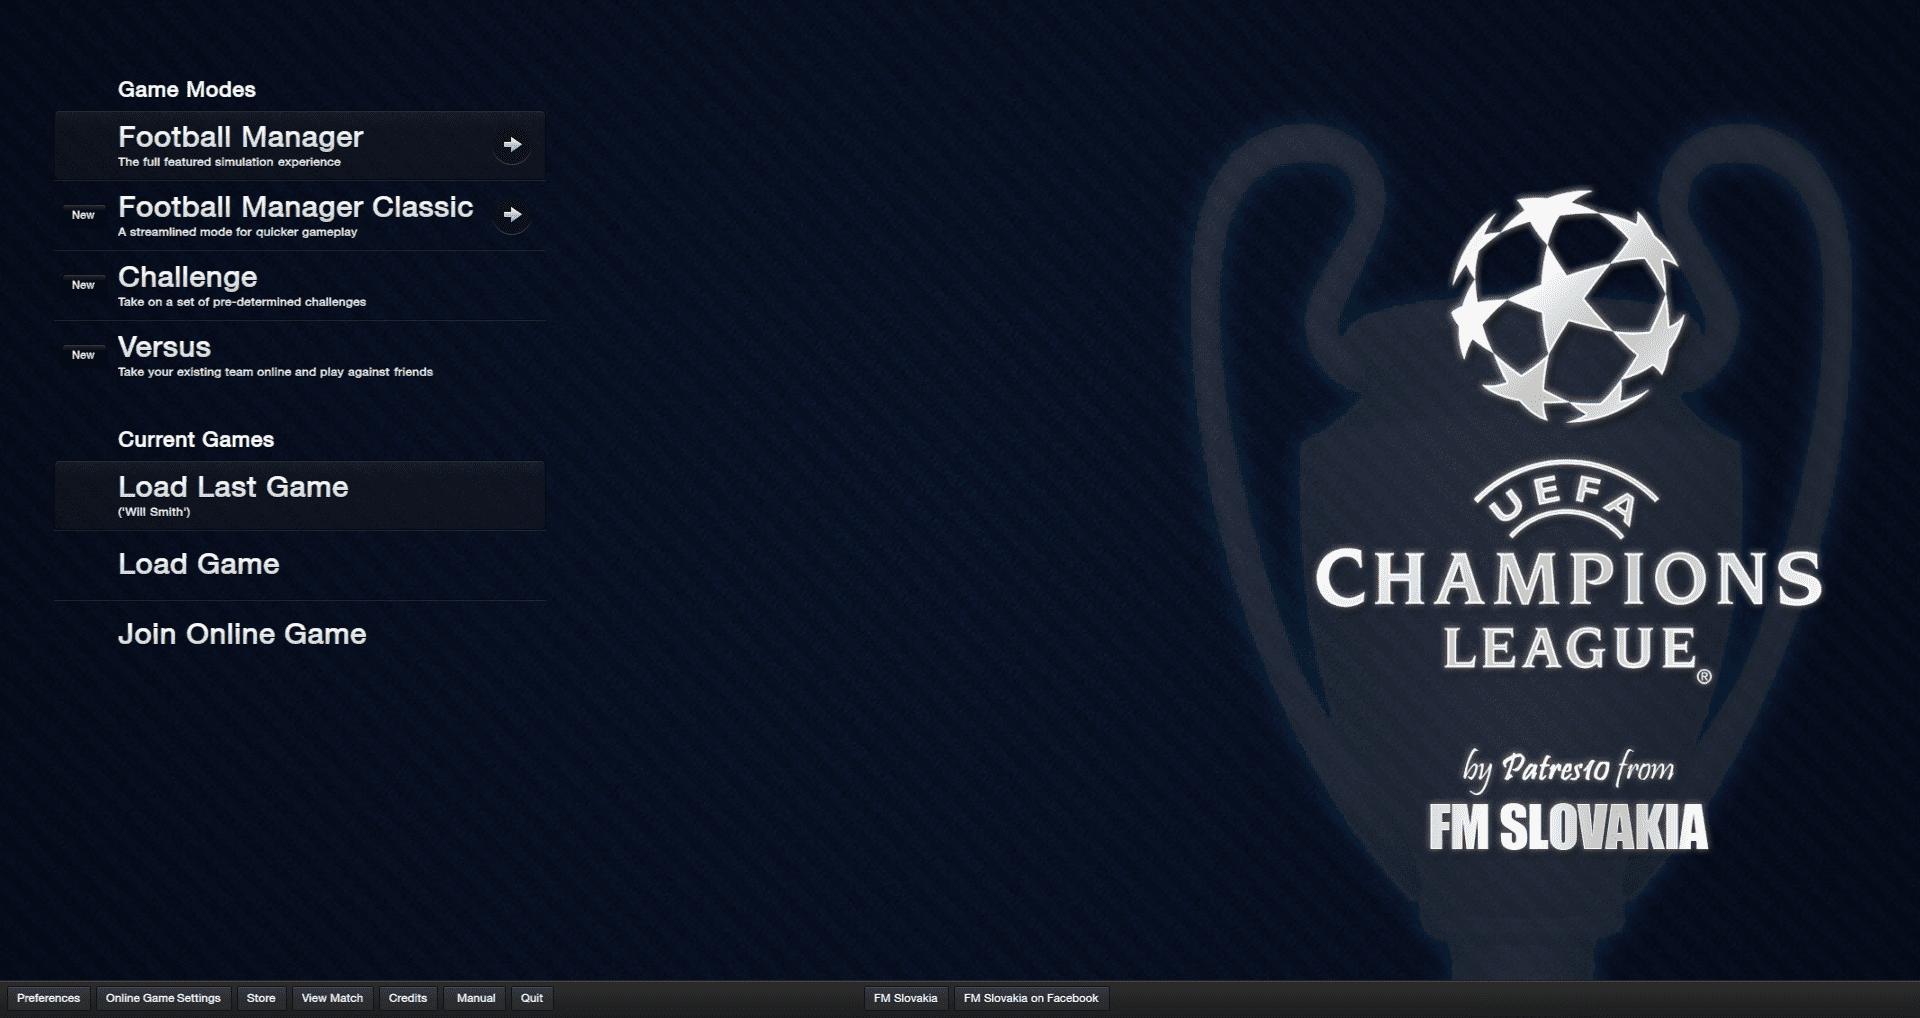 FM Slovakia Champions League skin